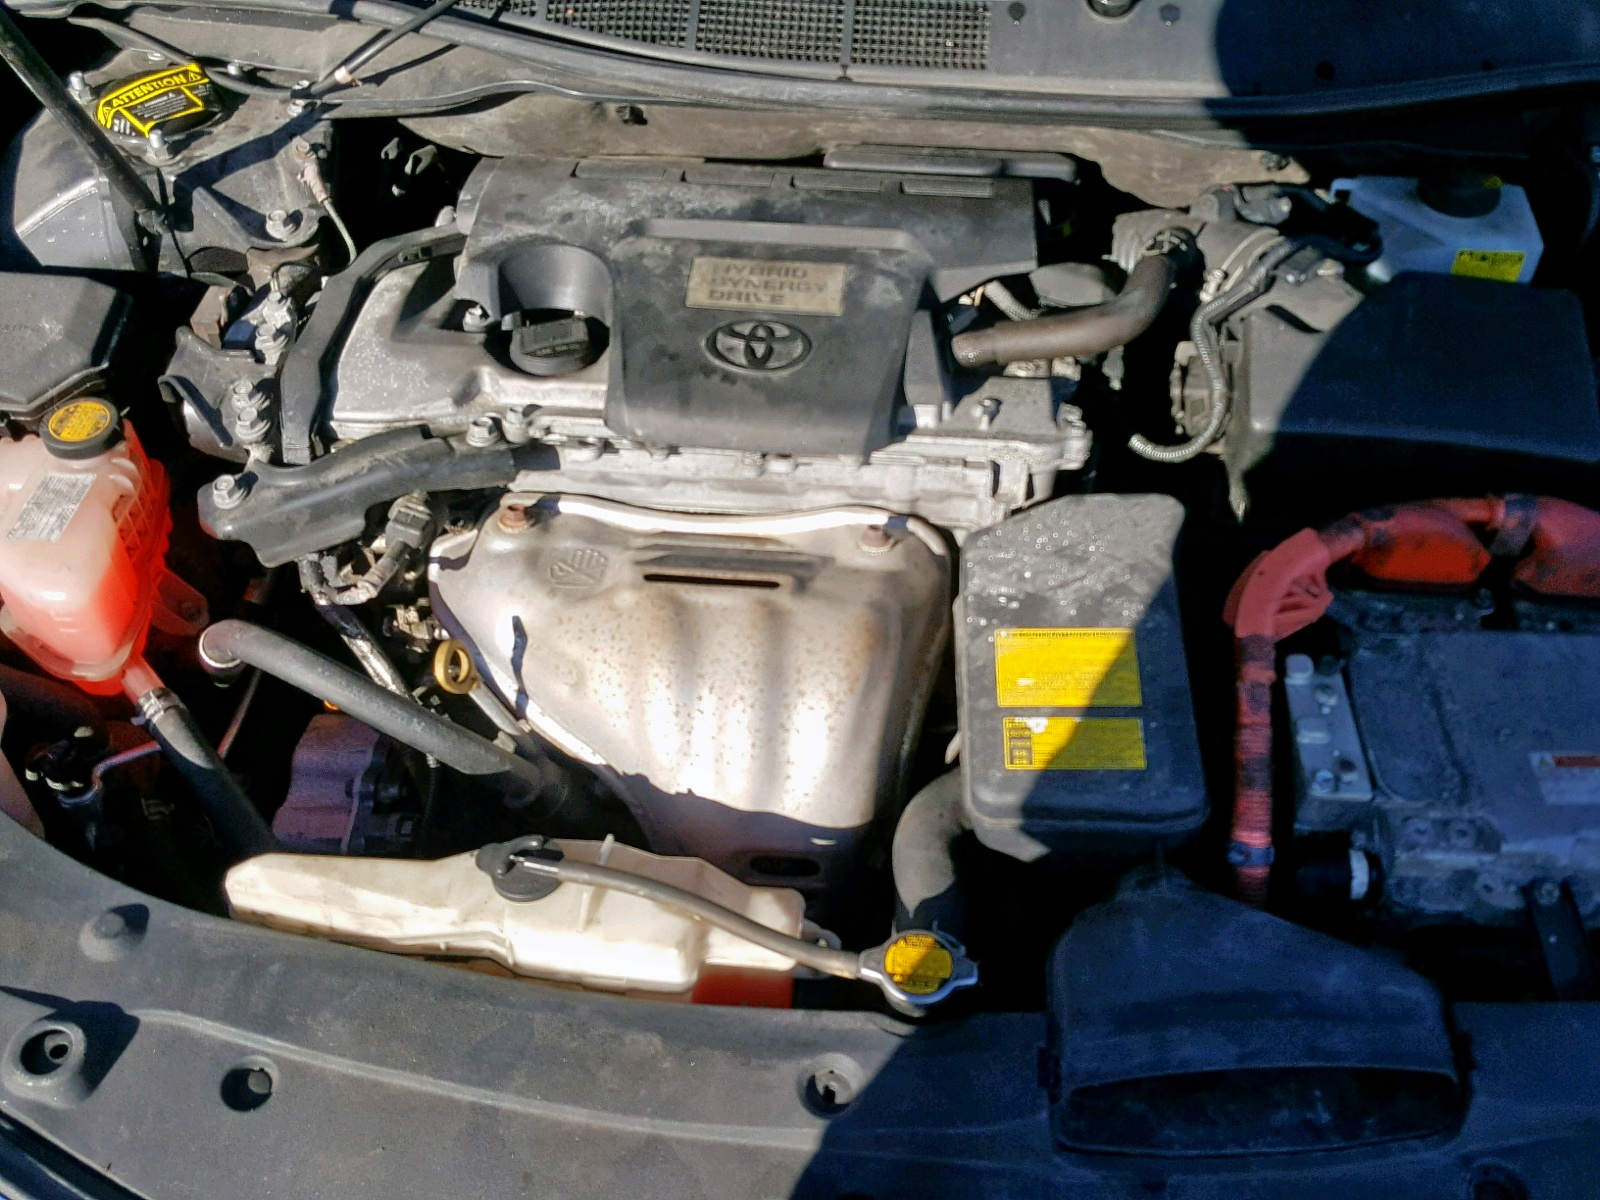 2014 Toyota Camry Hybr 2.5L inside view